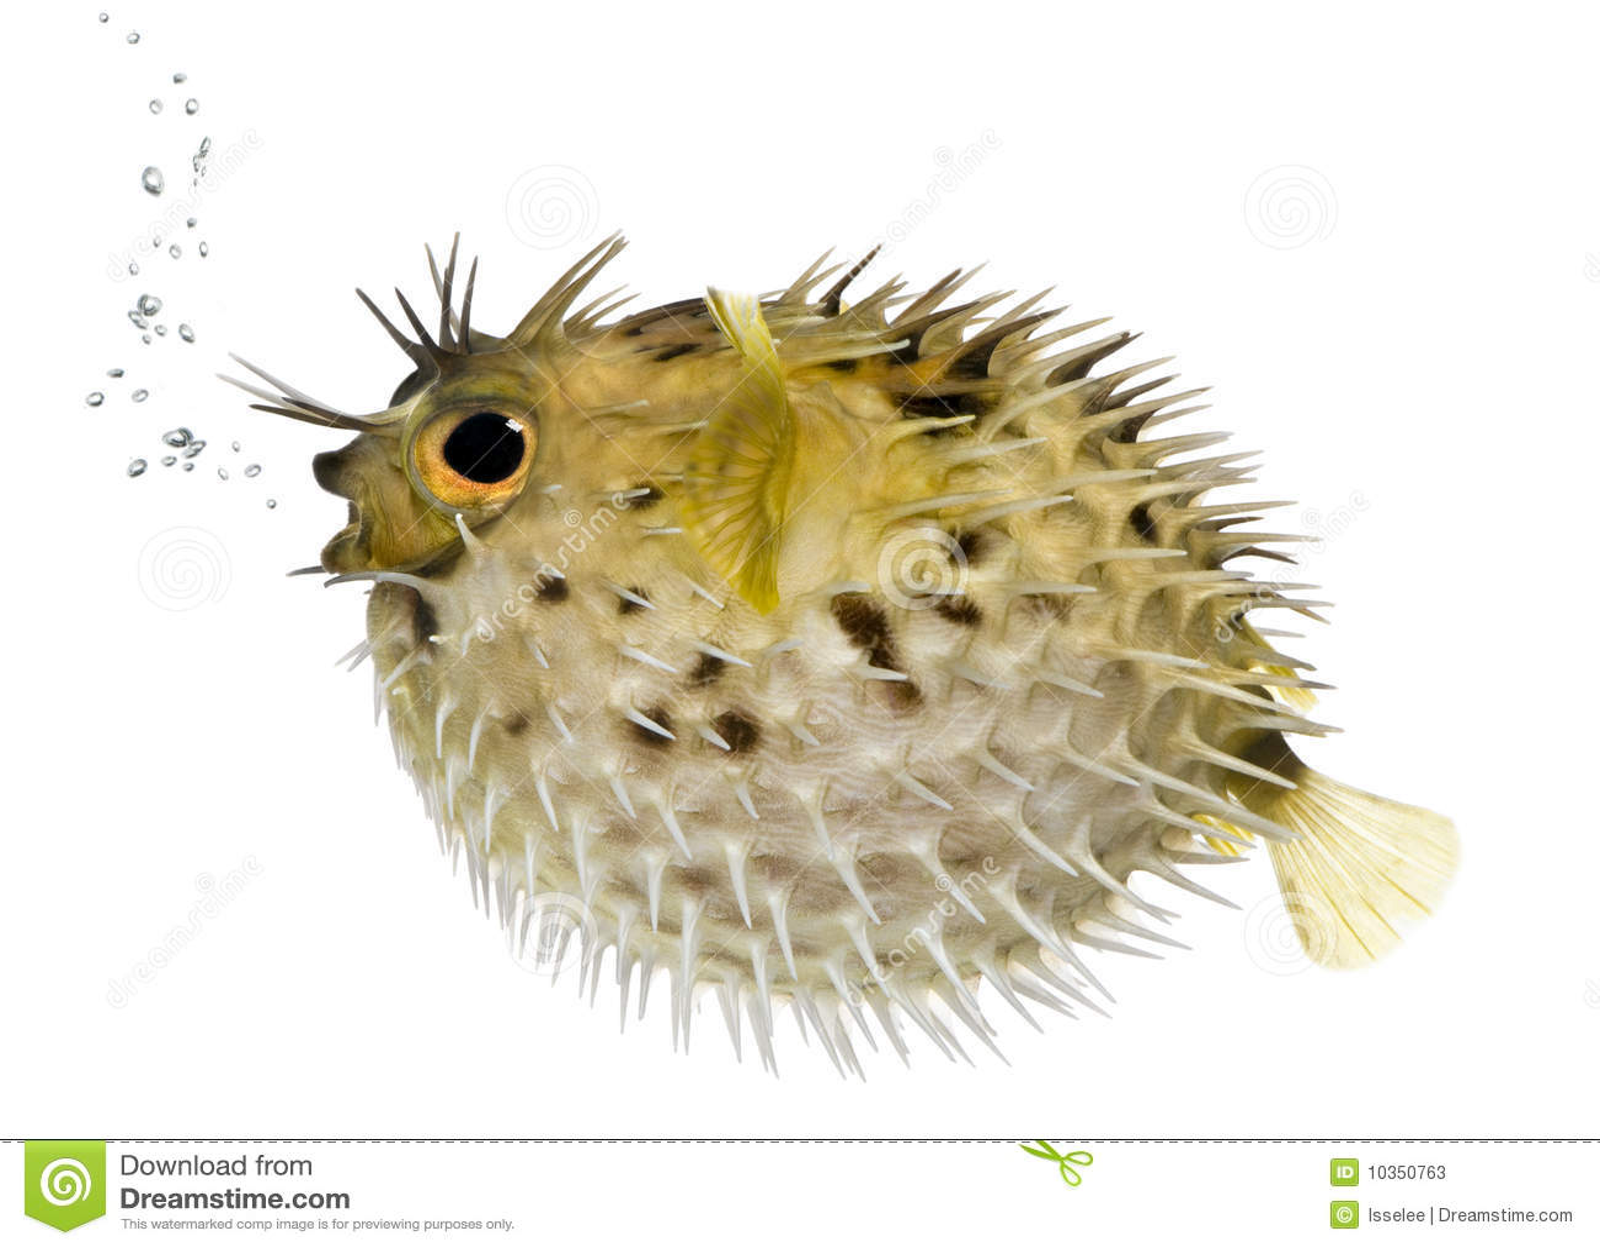 Porcupinefish długi kręgosłup